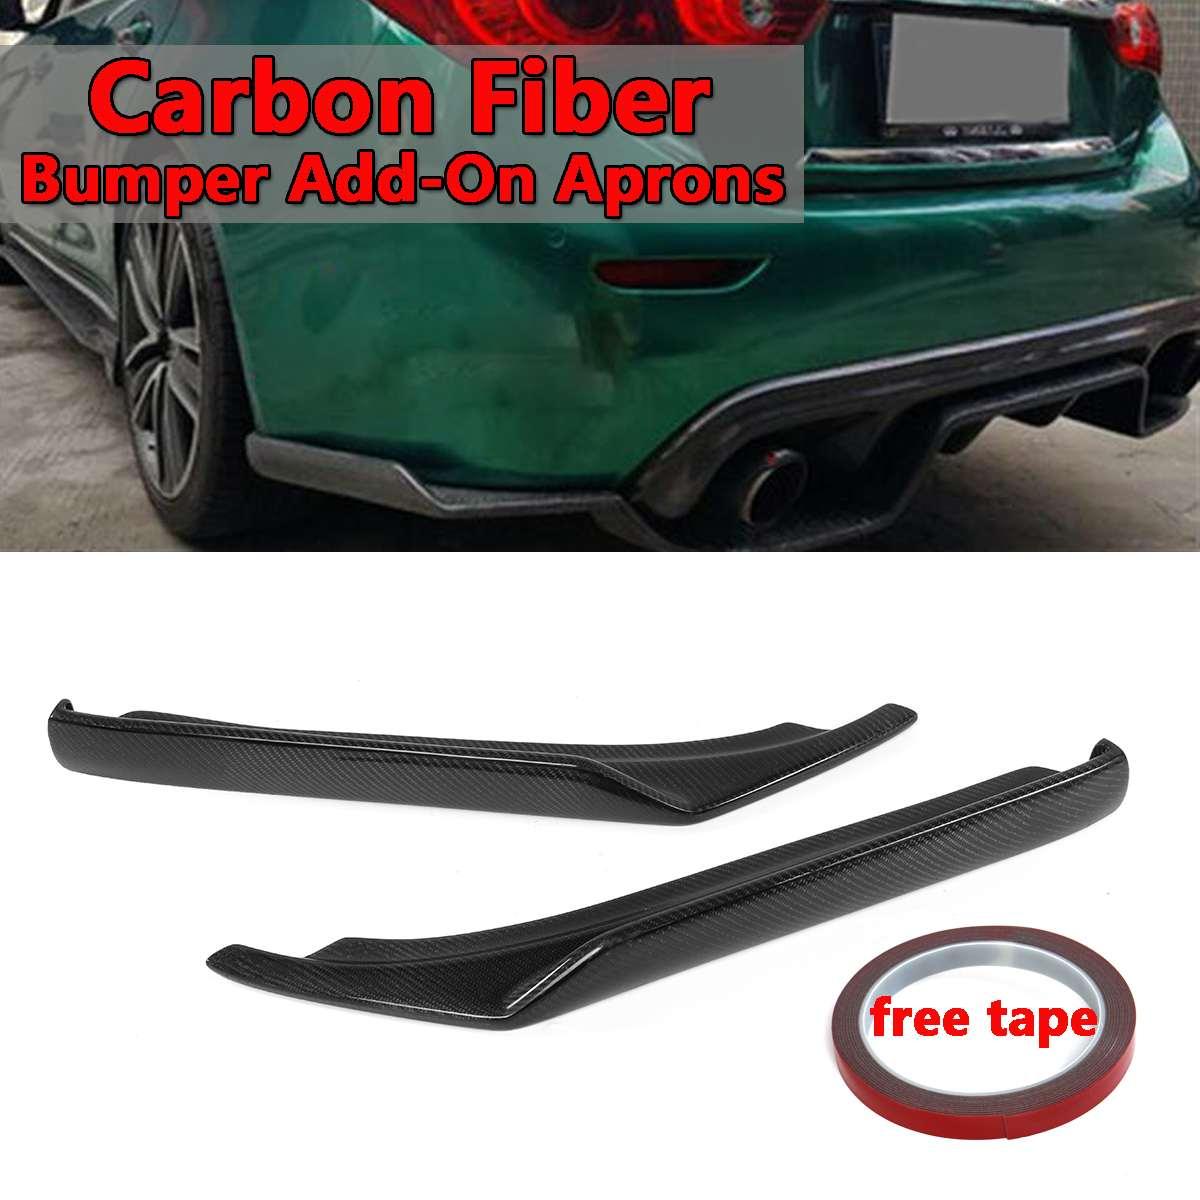 2x Real Carbon Fiber Car Rear Bumper Side Corner Deflector Spoiler Splitters Lip Add-On Aprons For Infiniti Q50 2014-20172x Real Carbon Fiber Car Rear Bumper Side Corner Deflector Spoiler Splitters Lip Add-On Aprons For Infiniti Q50 2014-2017